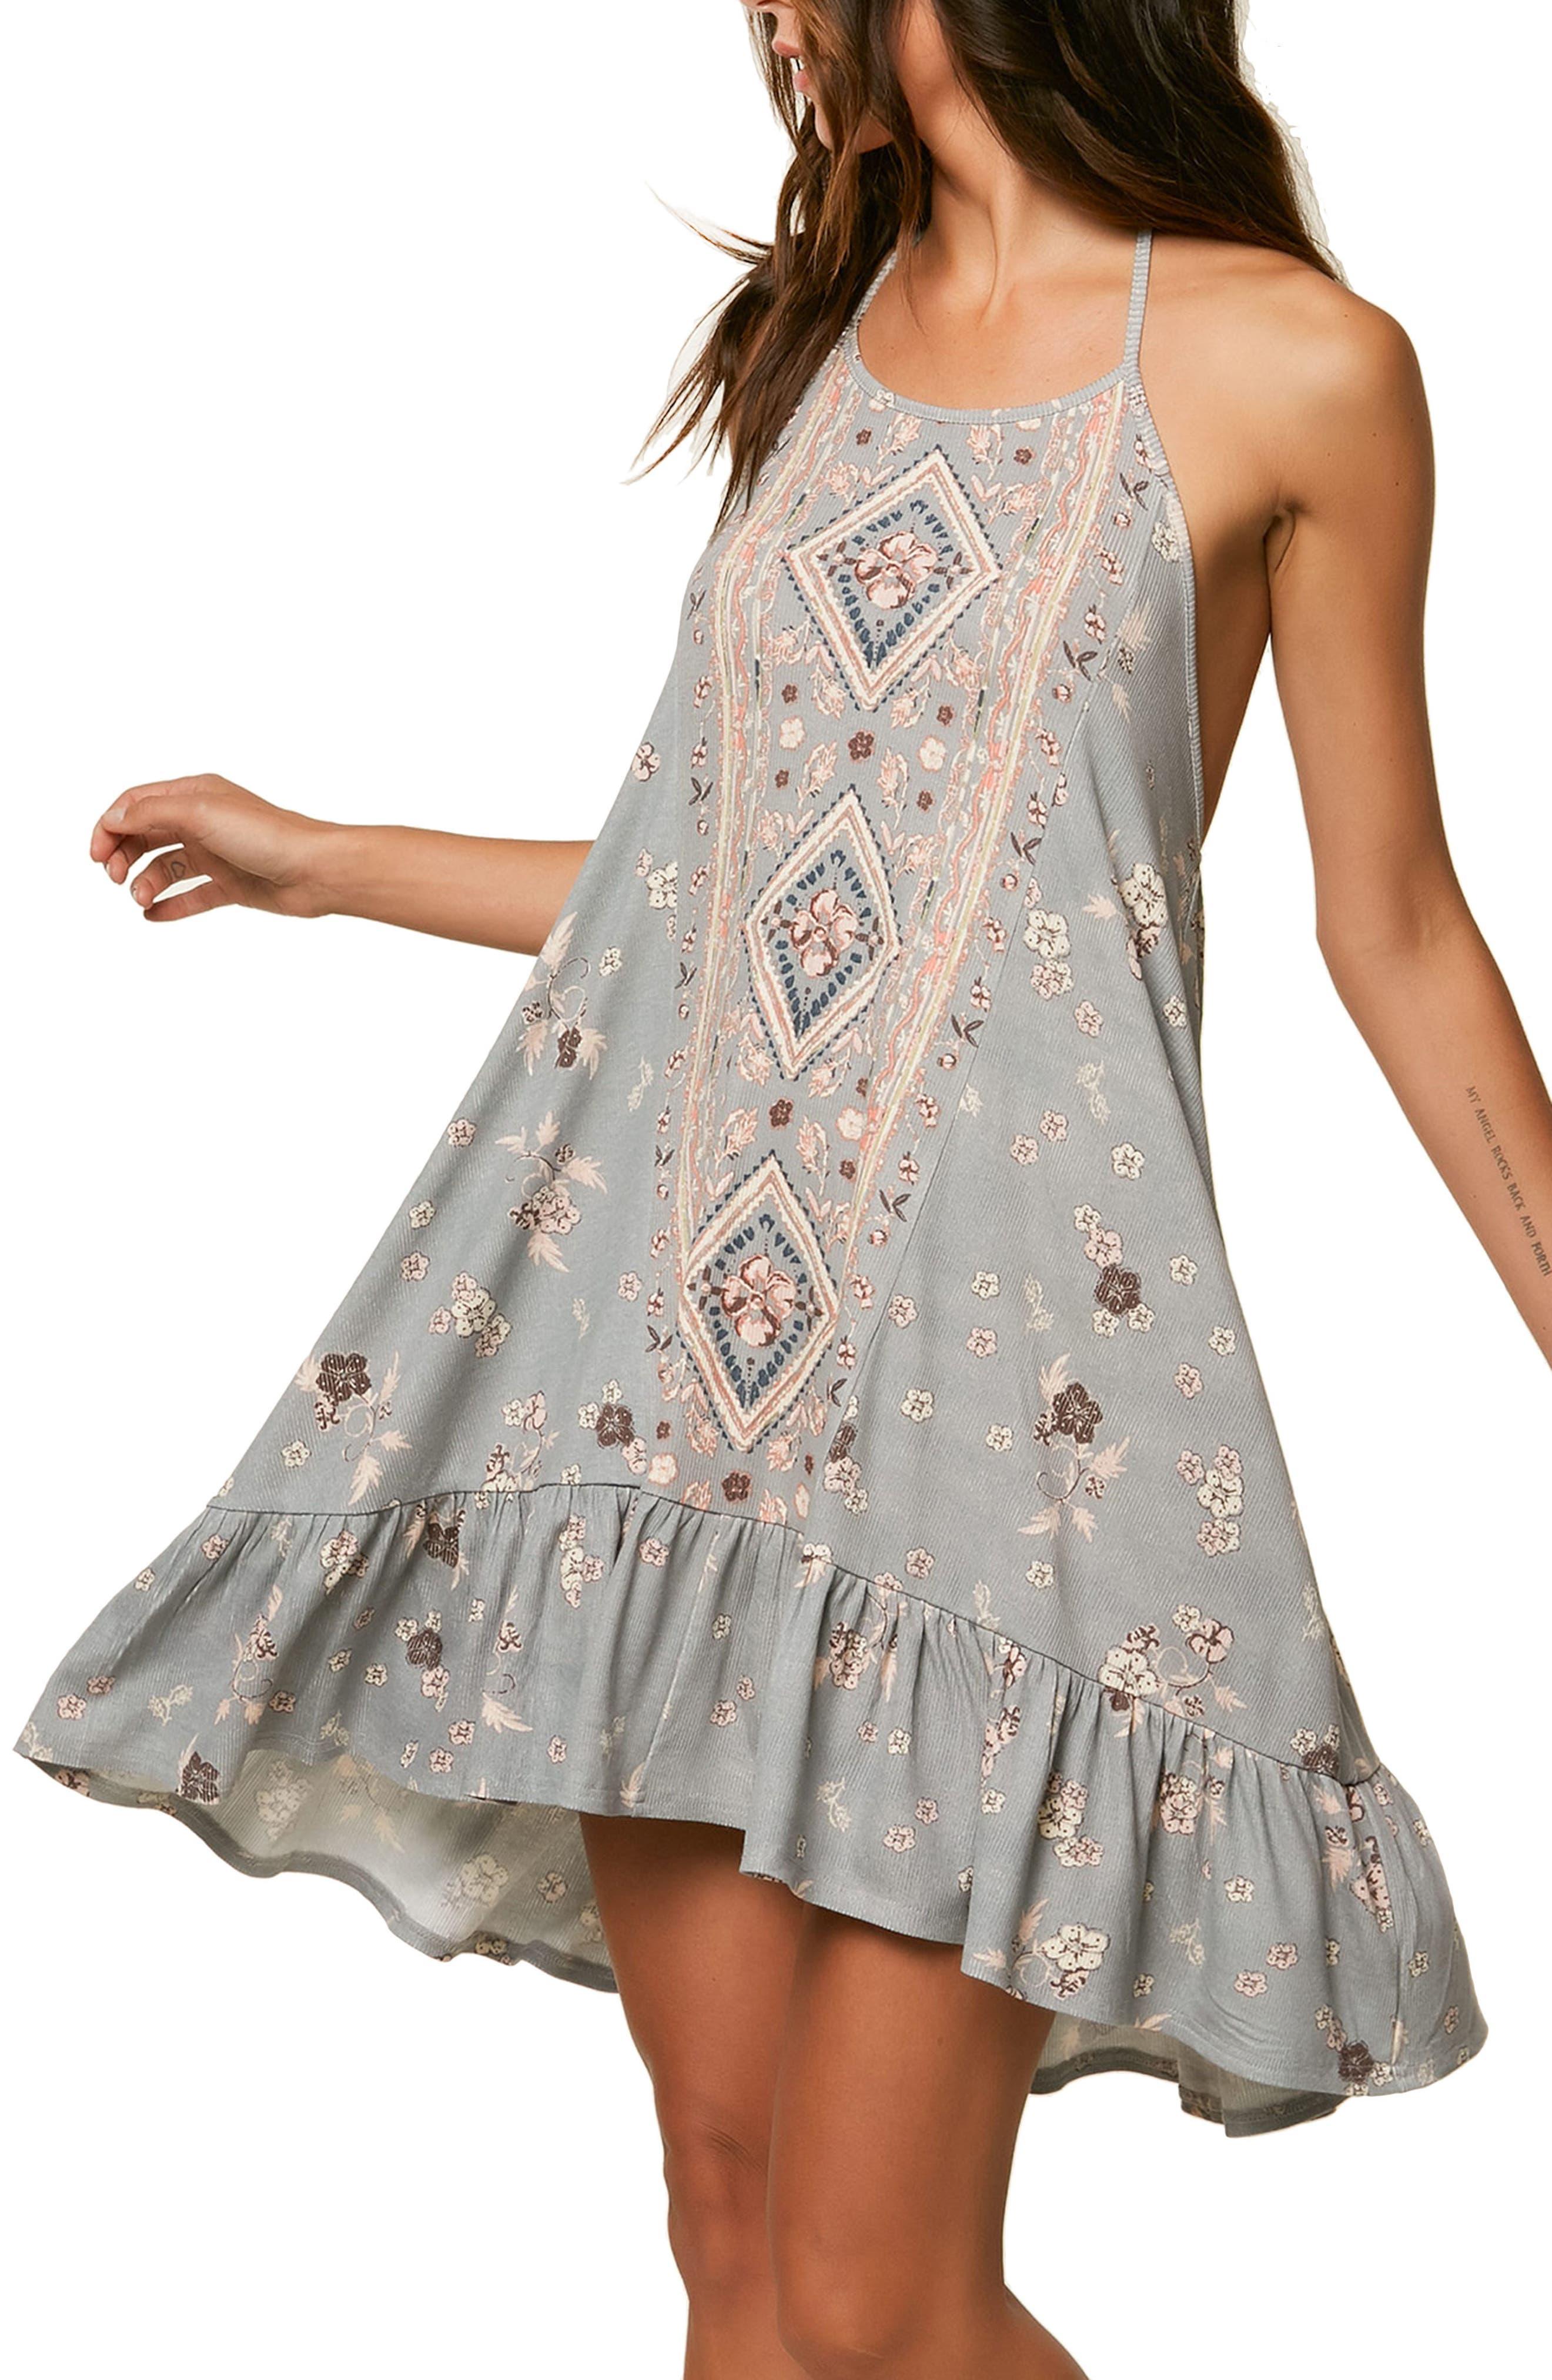 Sonoma Print Halter Dress,                         Main,                         color, Neutral Gray